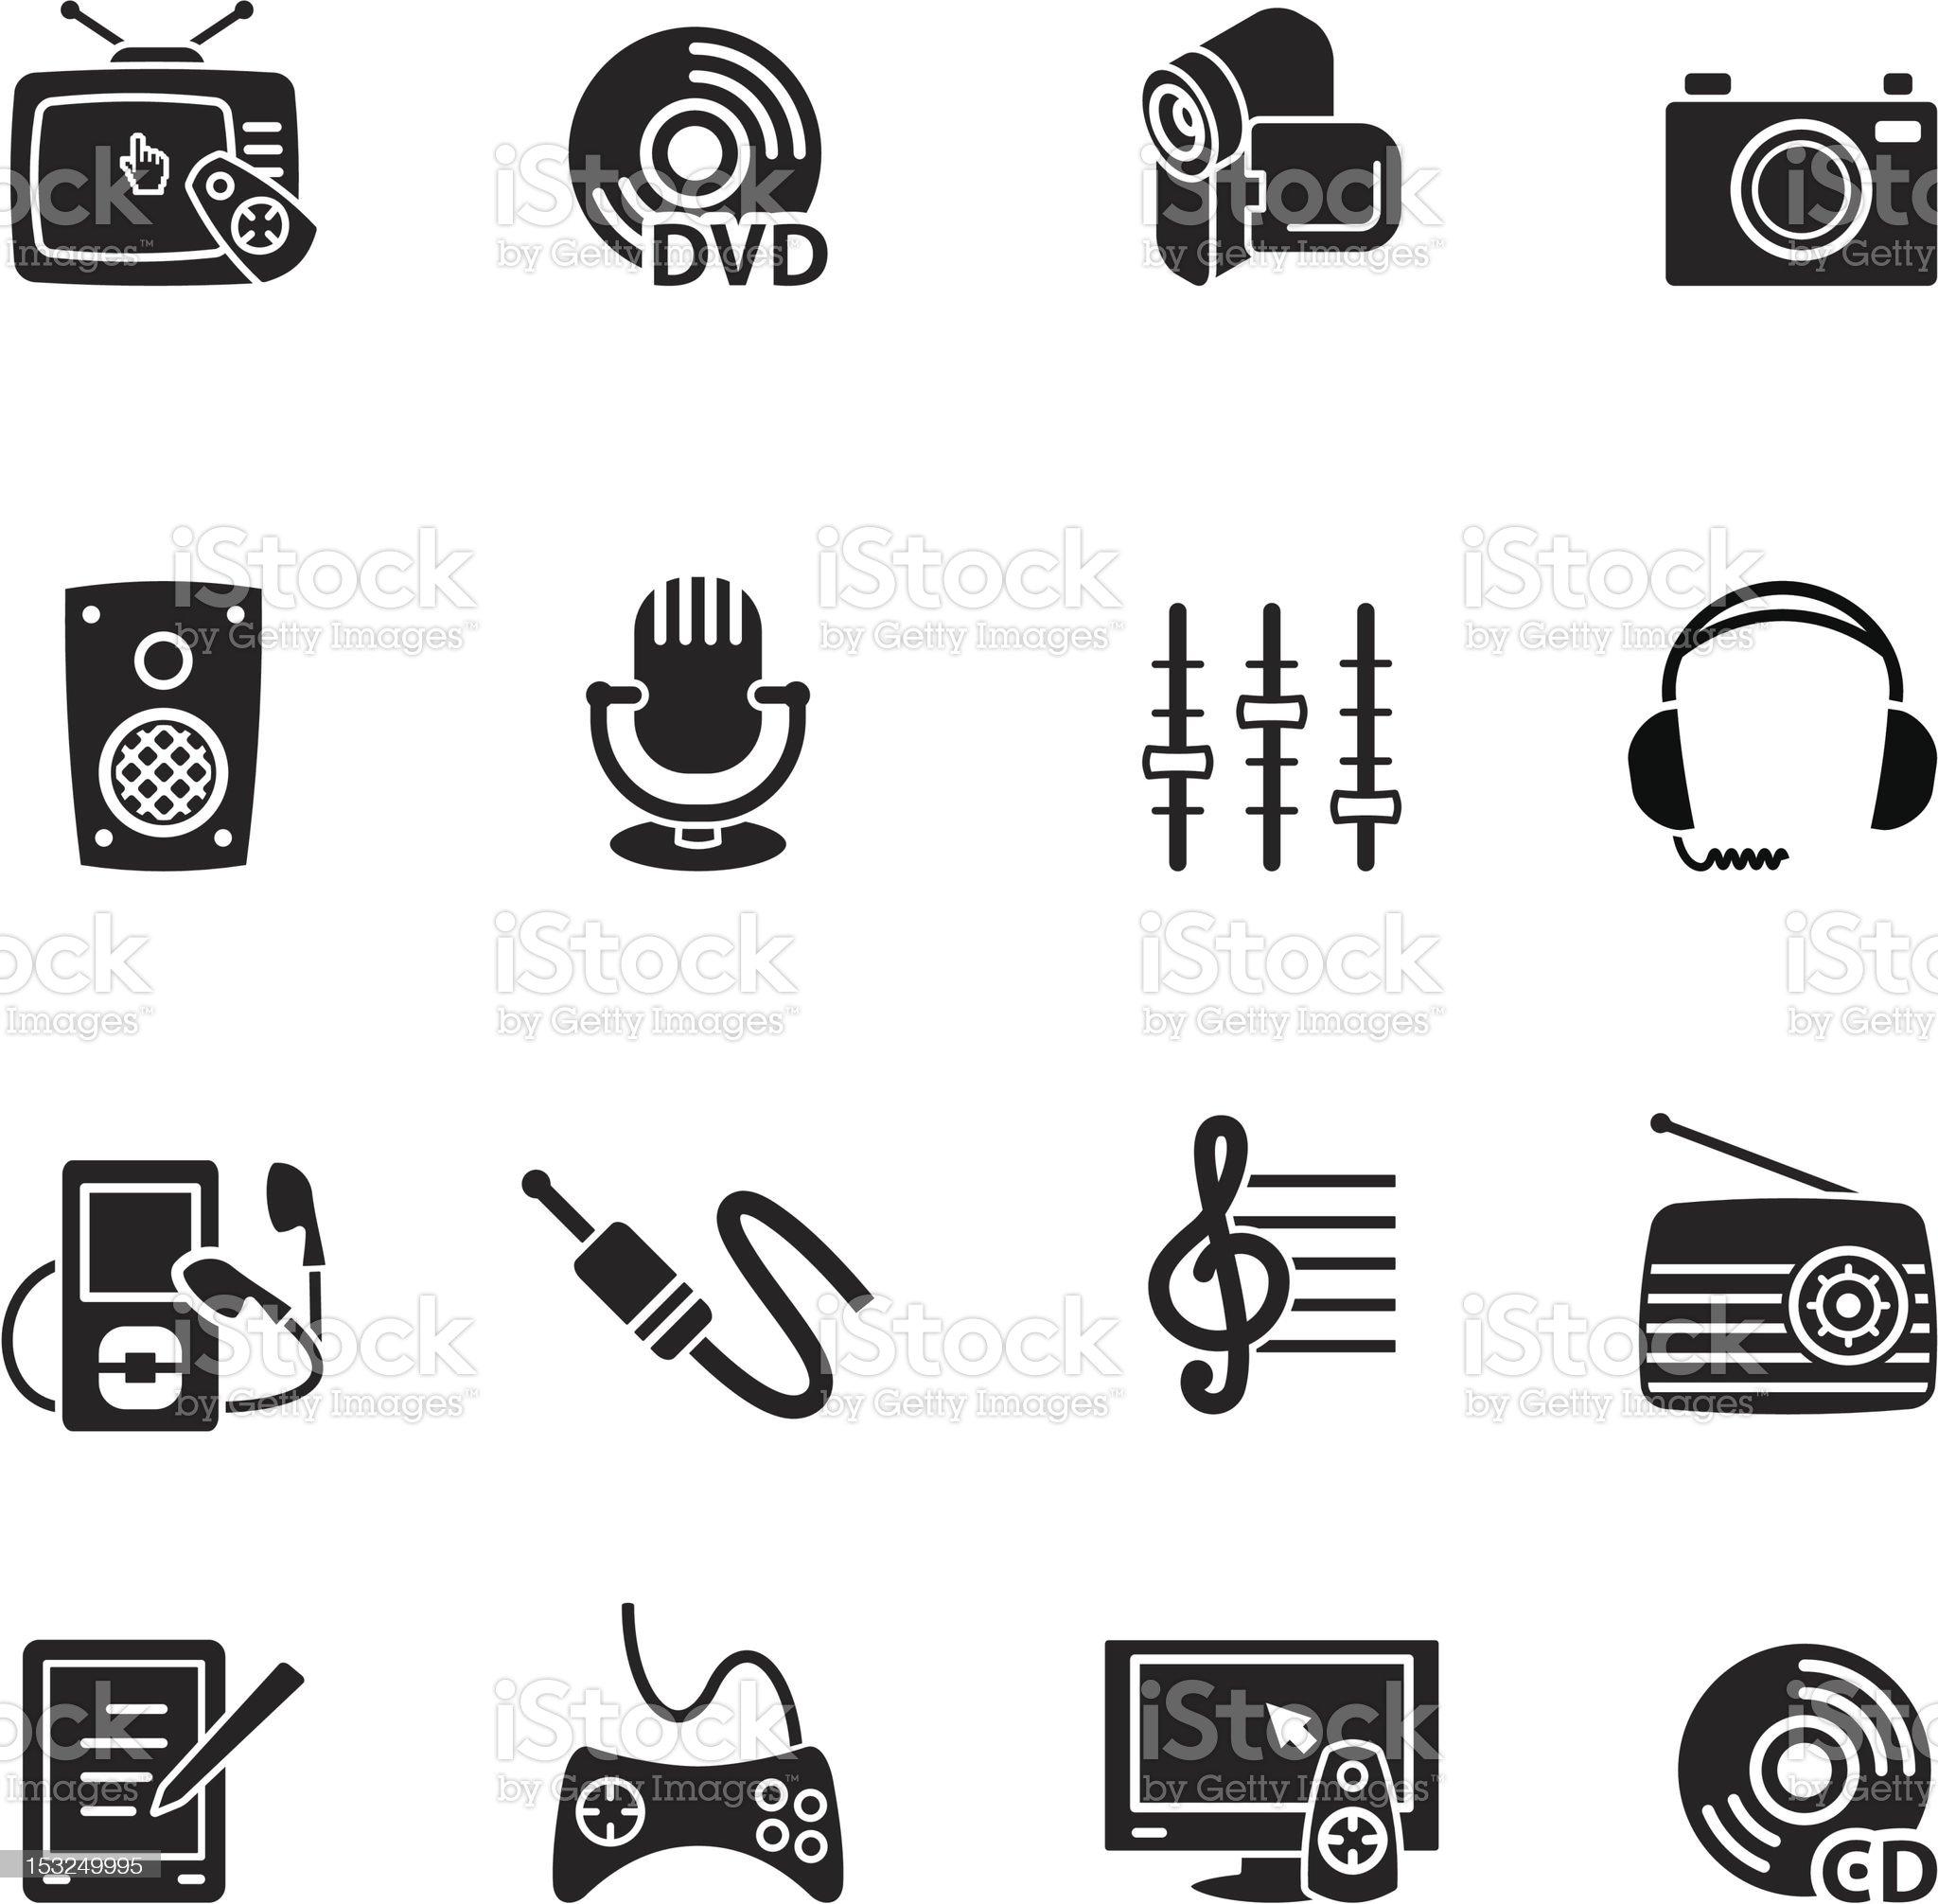 Multimedia computer icon set royalty-free stock vector art